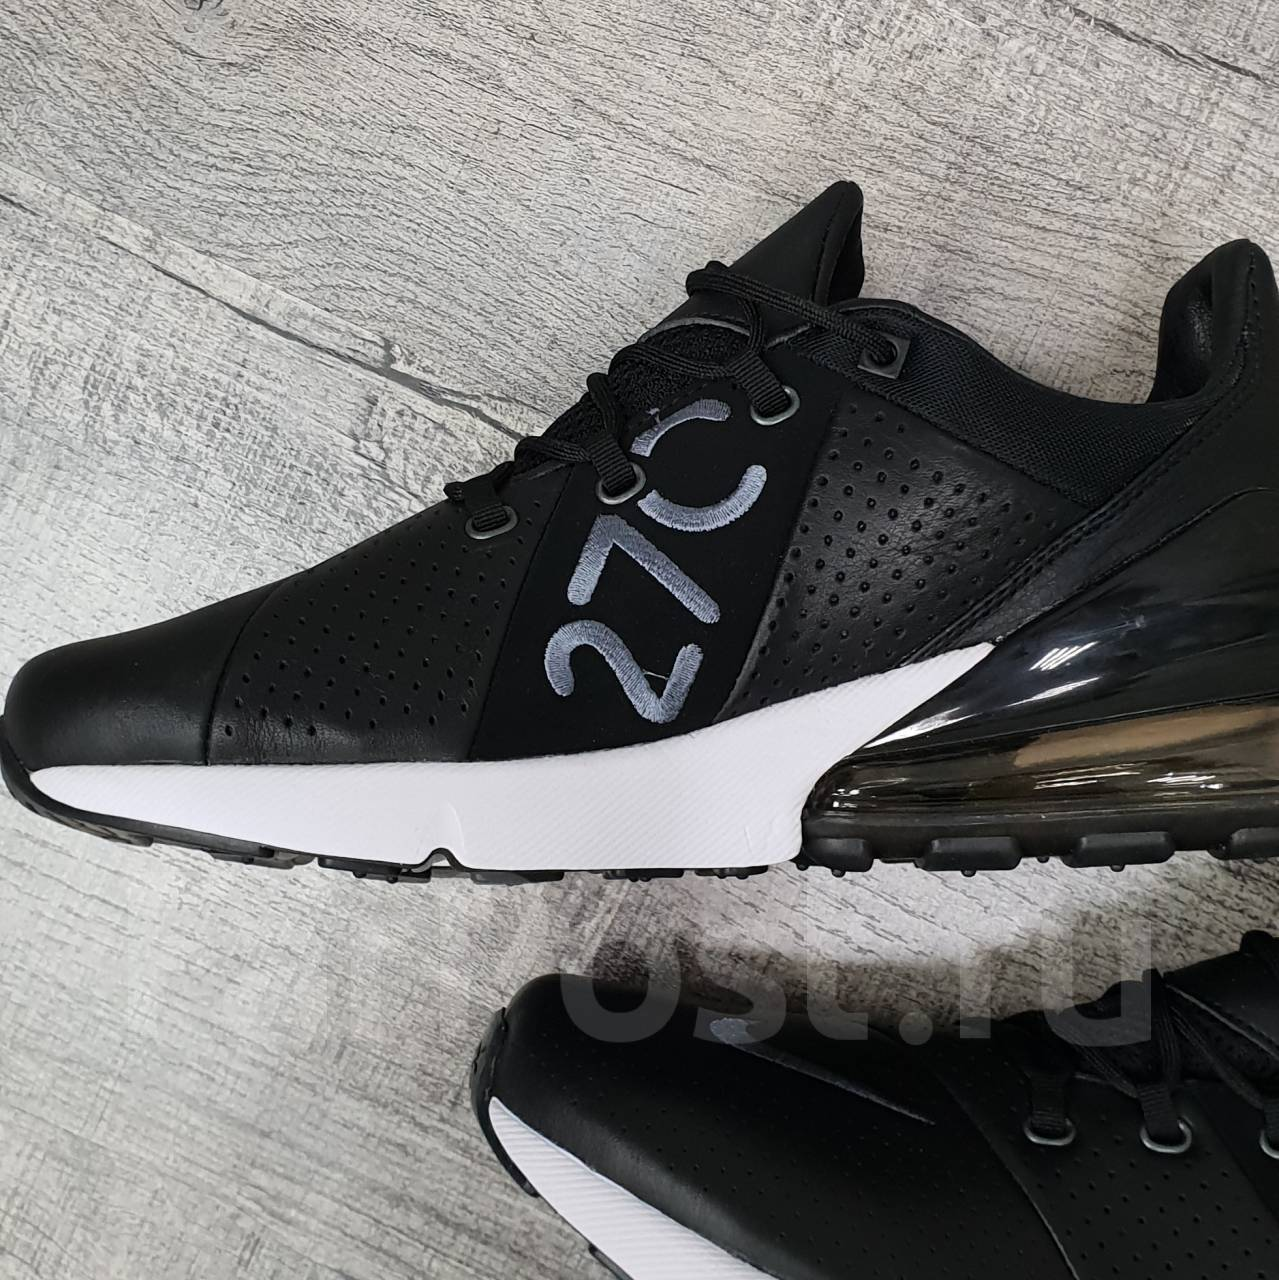 a0a212e5b65 Мужская обувь - купить. Цены